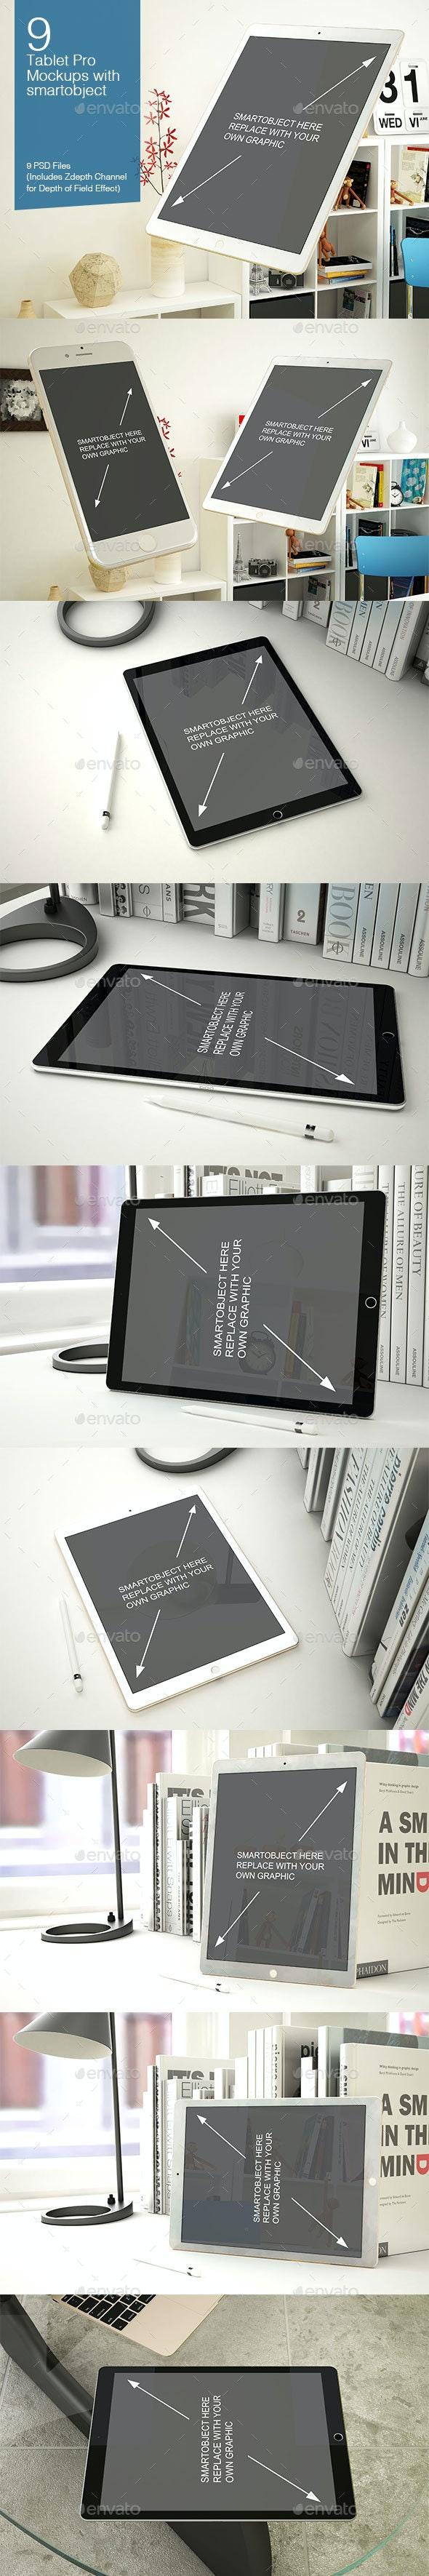 Tablet Mockup 9 Poses - Mobile Displays